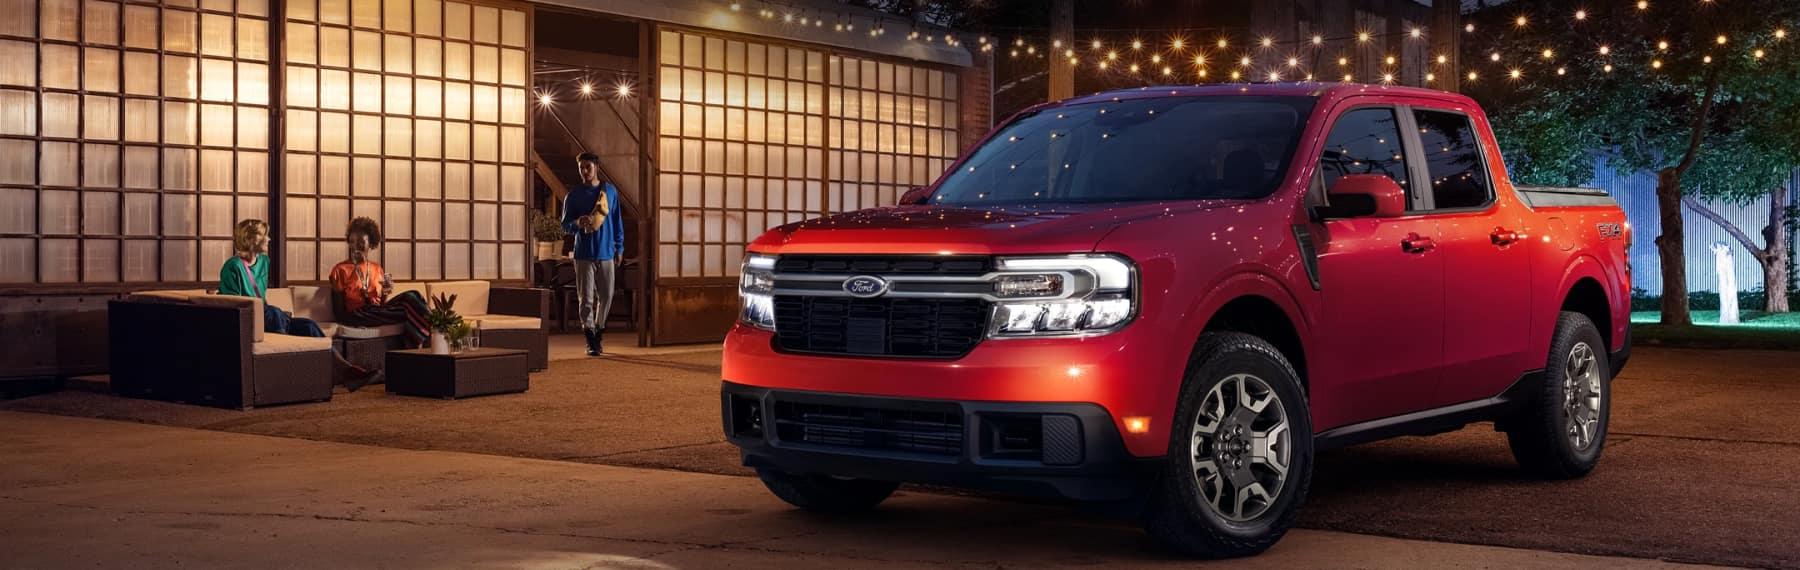 Red Ford Explorer